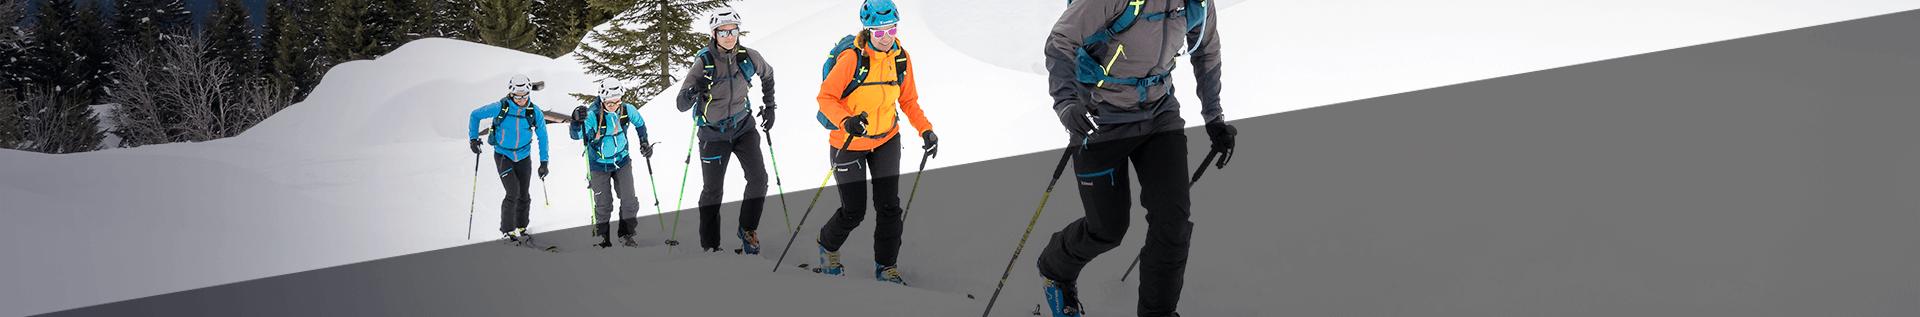 Аксесуари до бігу на лижах